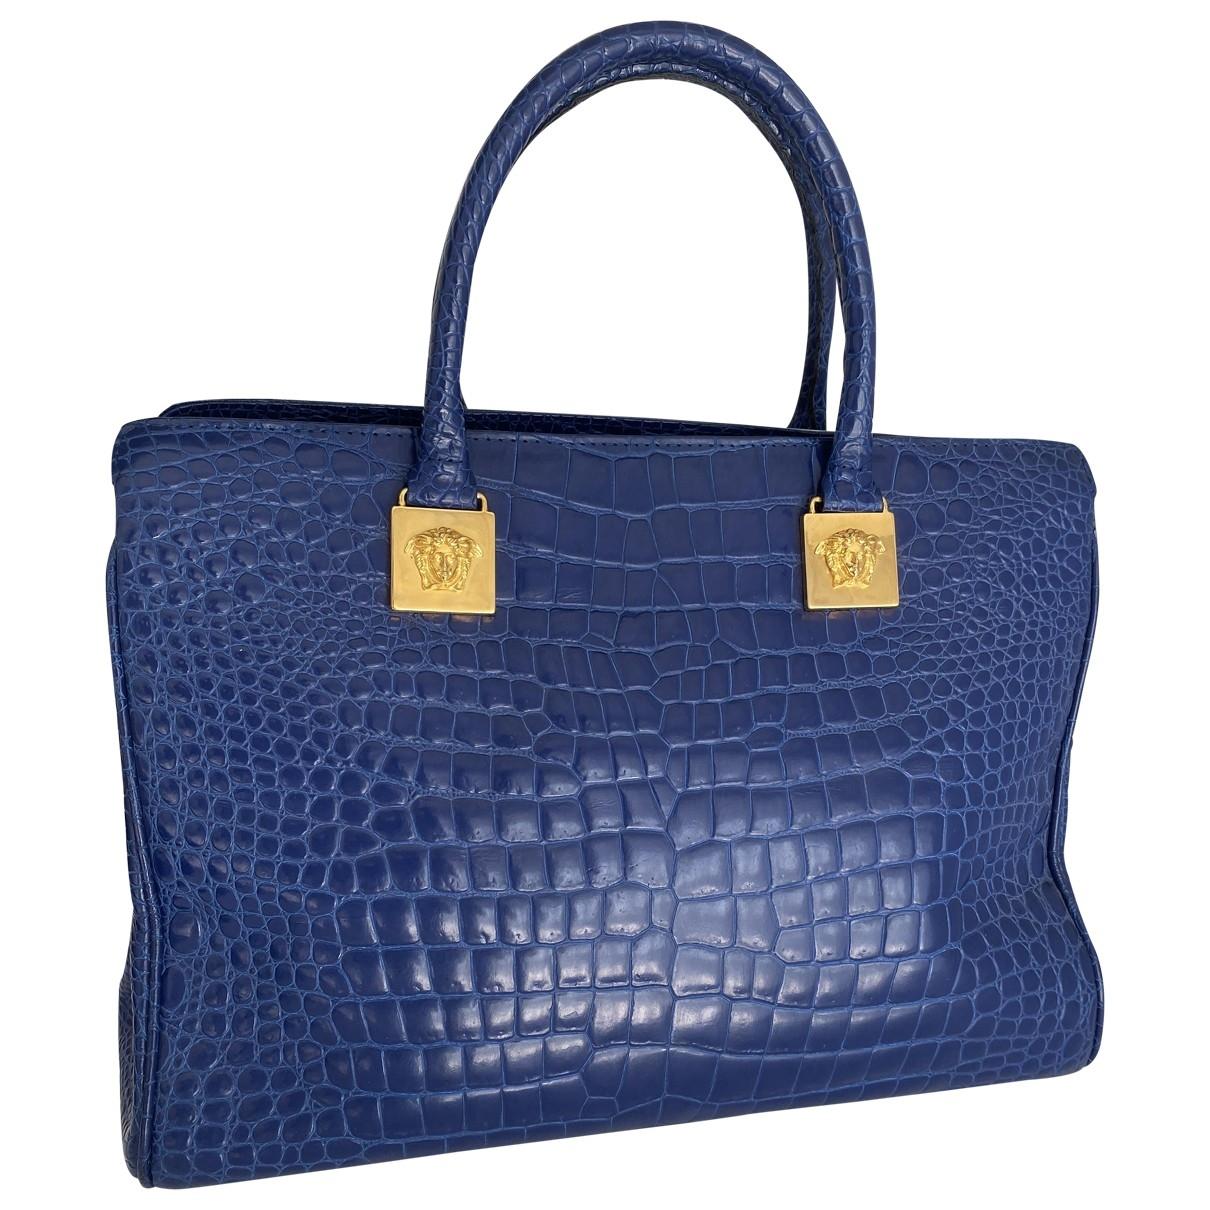 Gianni Versace \N Handtasche in  Blau Leder